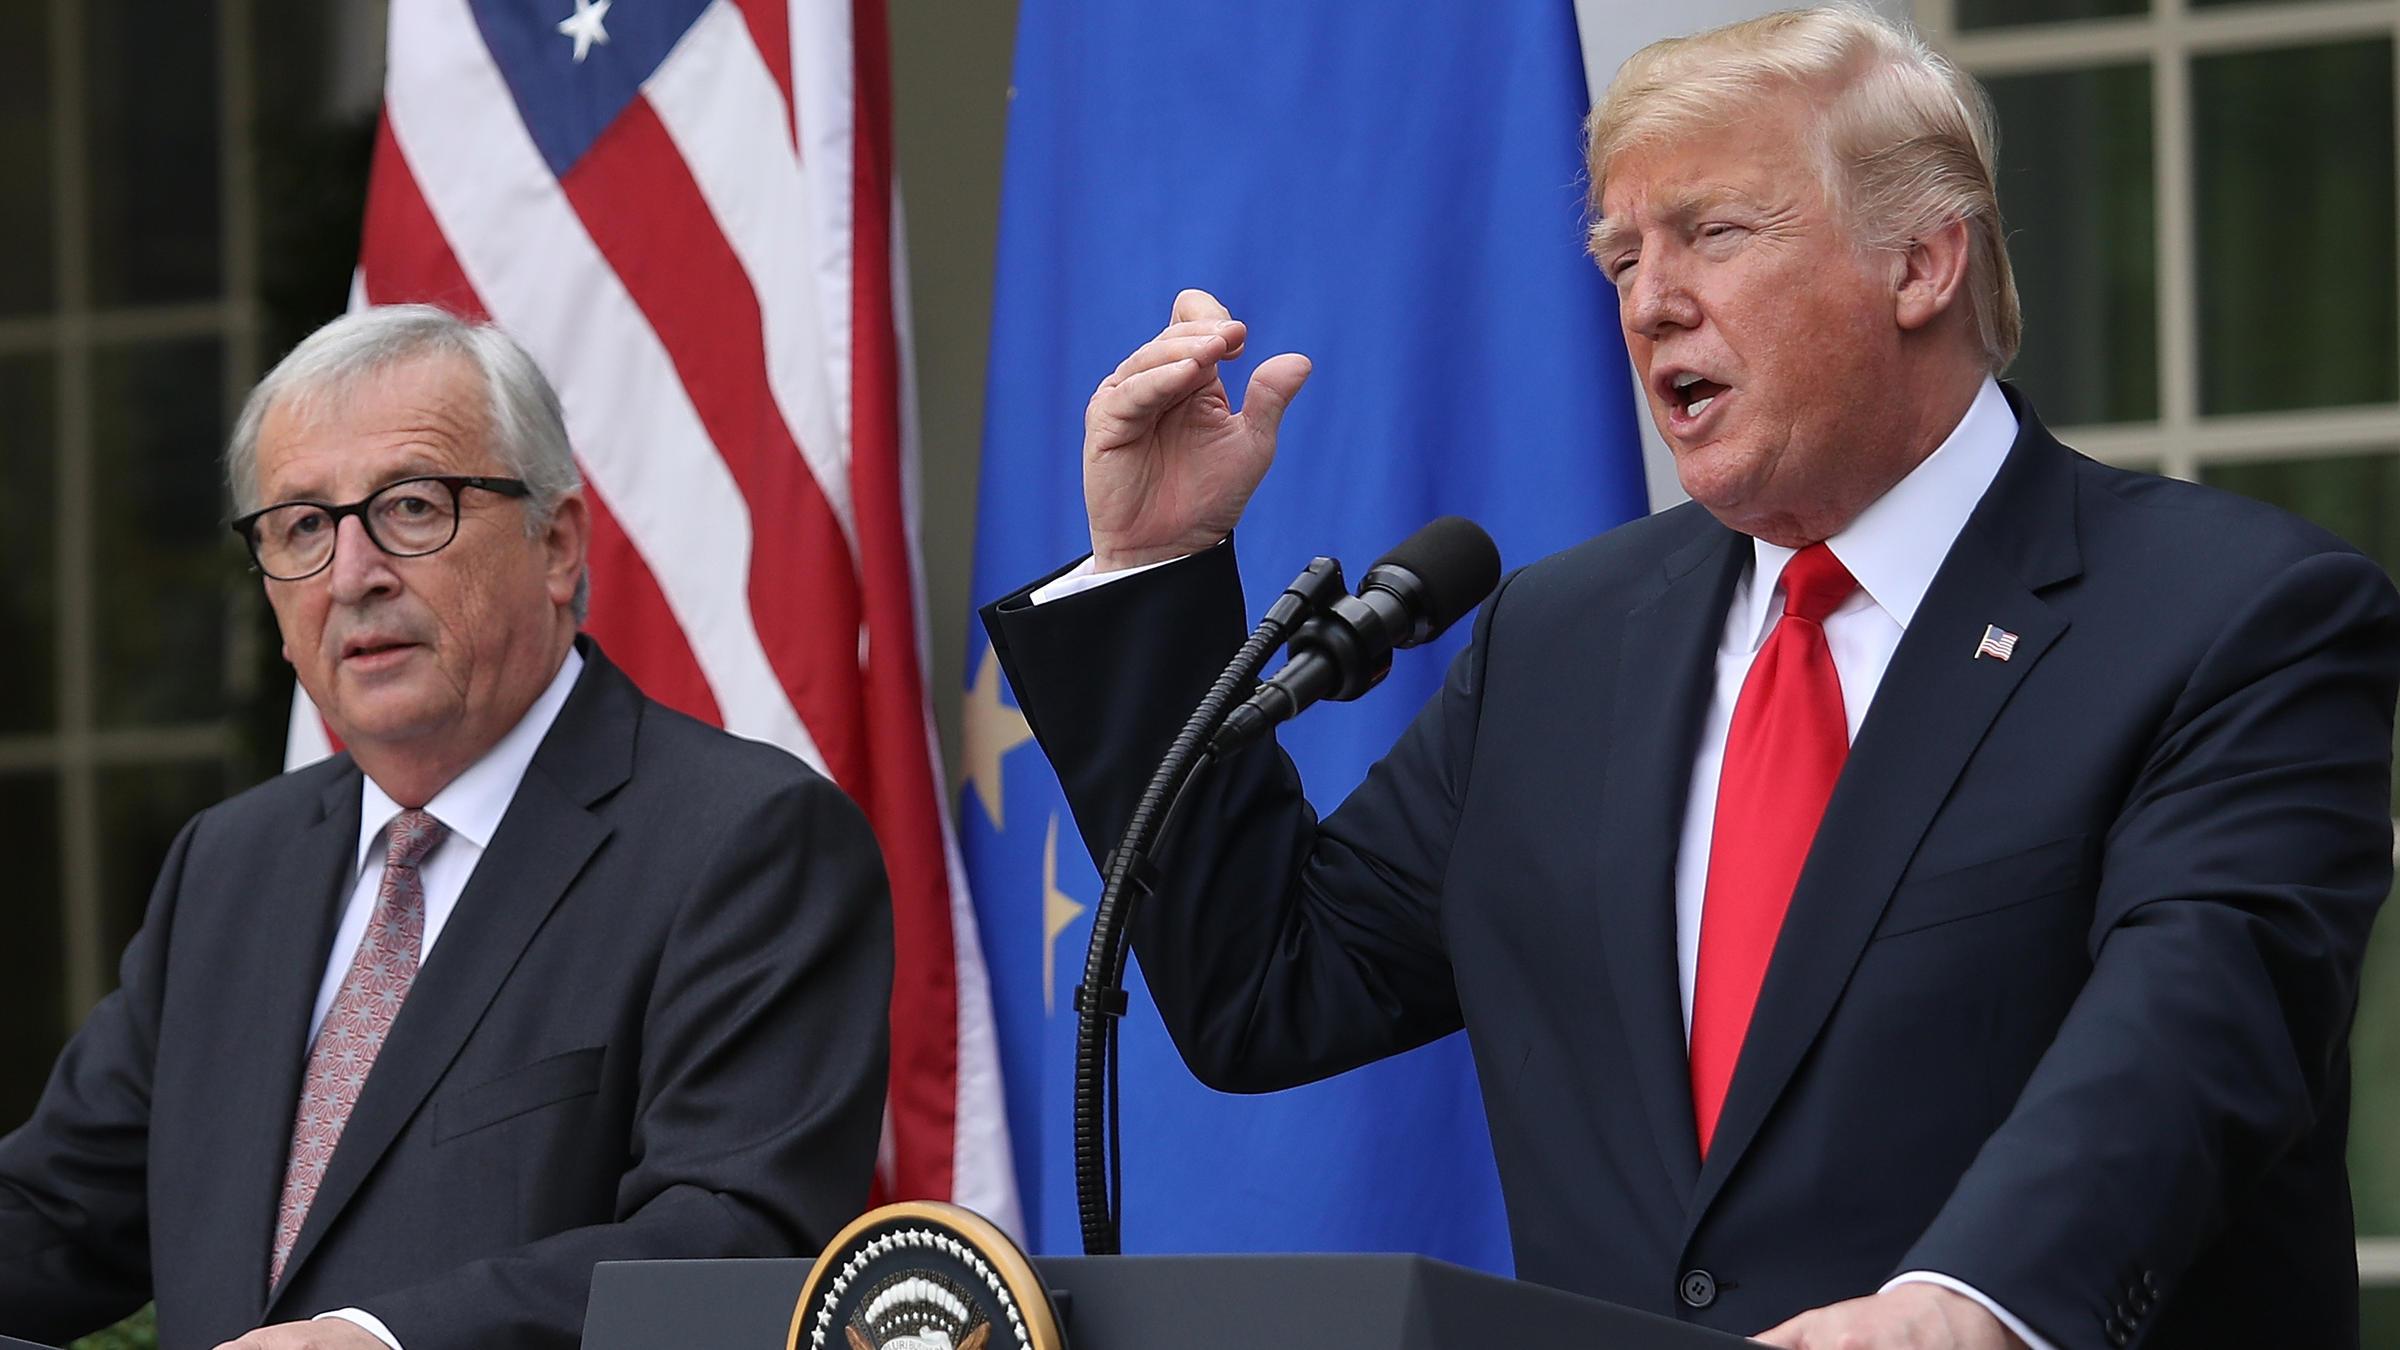 Trump And EU Agree To Work Toward Zero Tariffs ...